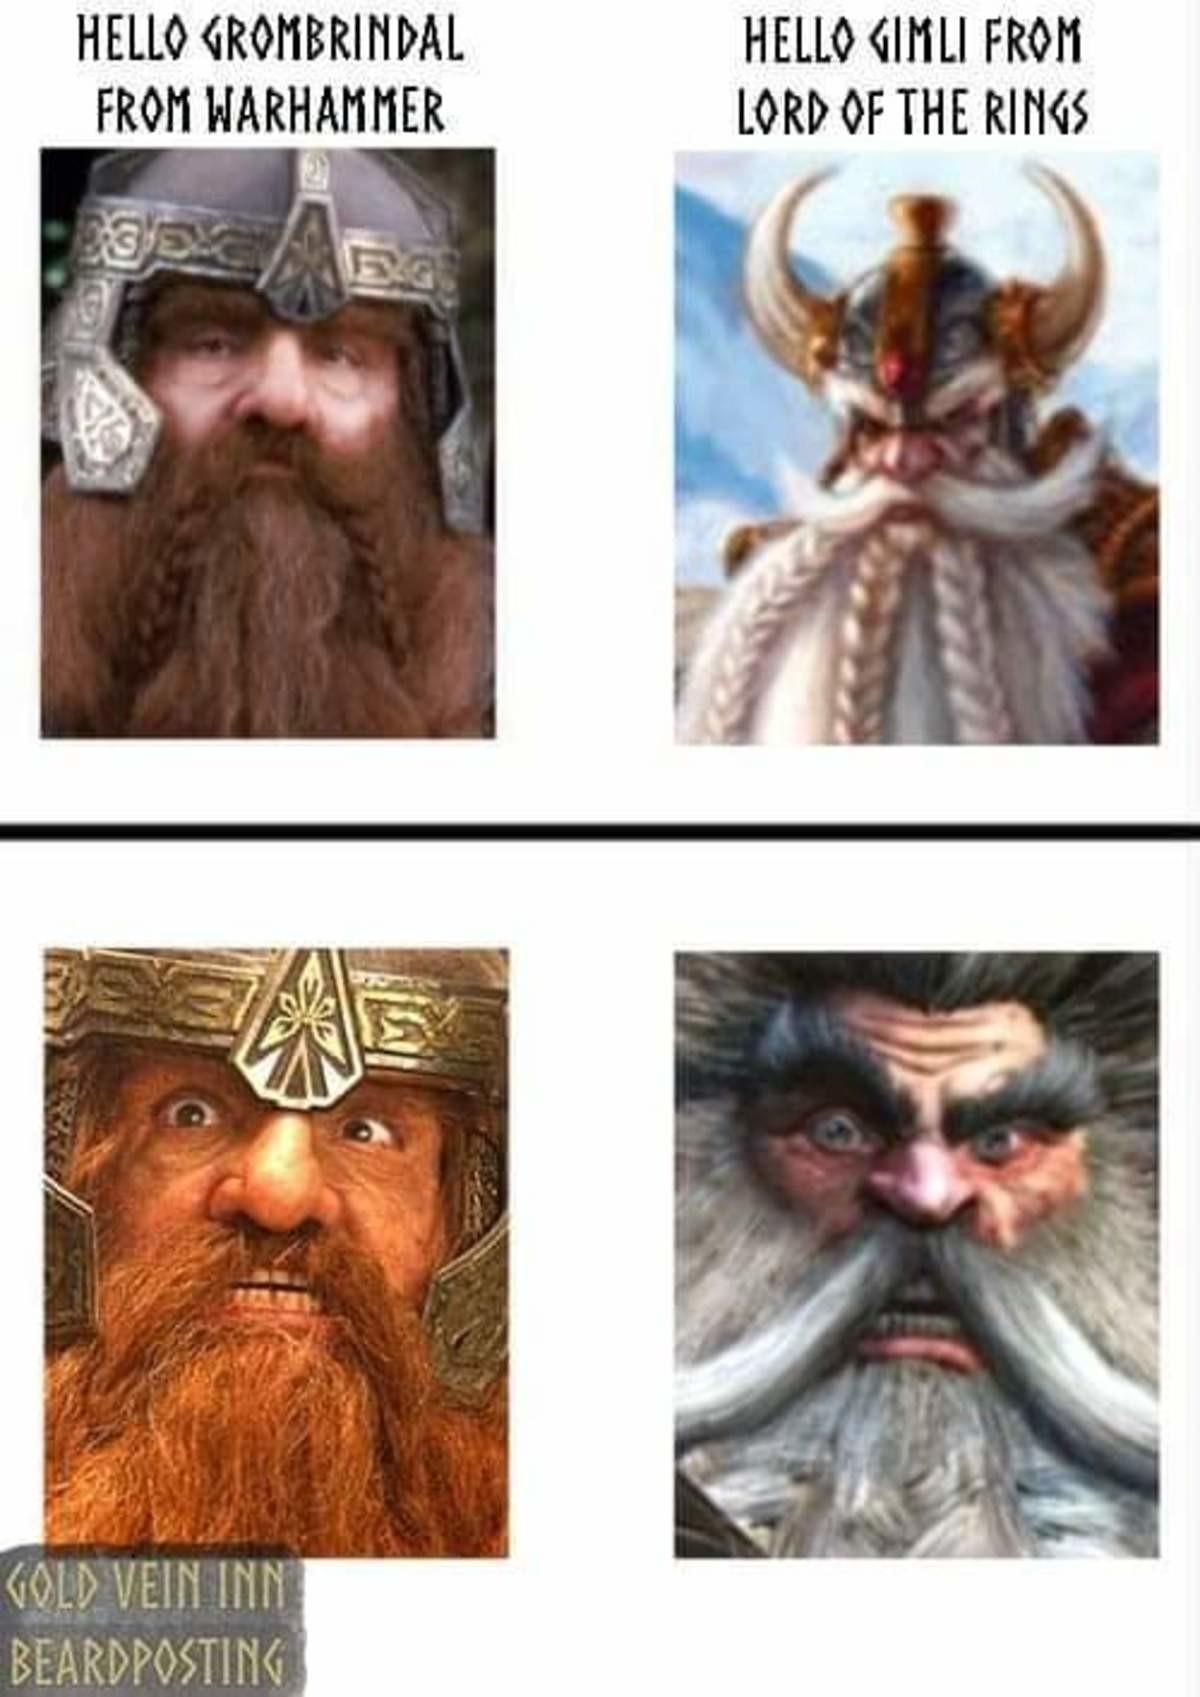 Dwarf. .. Rock and stone, to the bone.